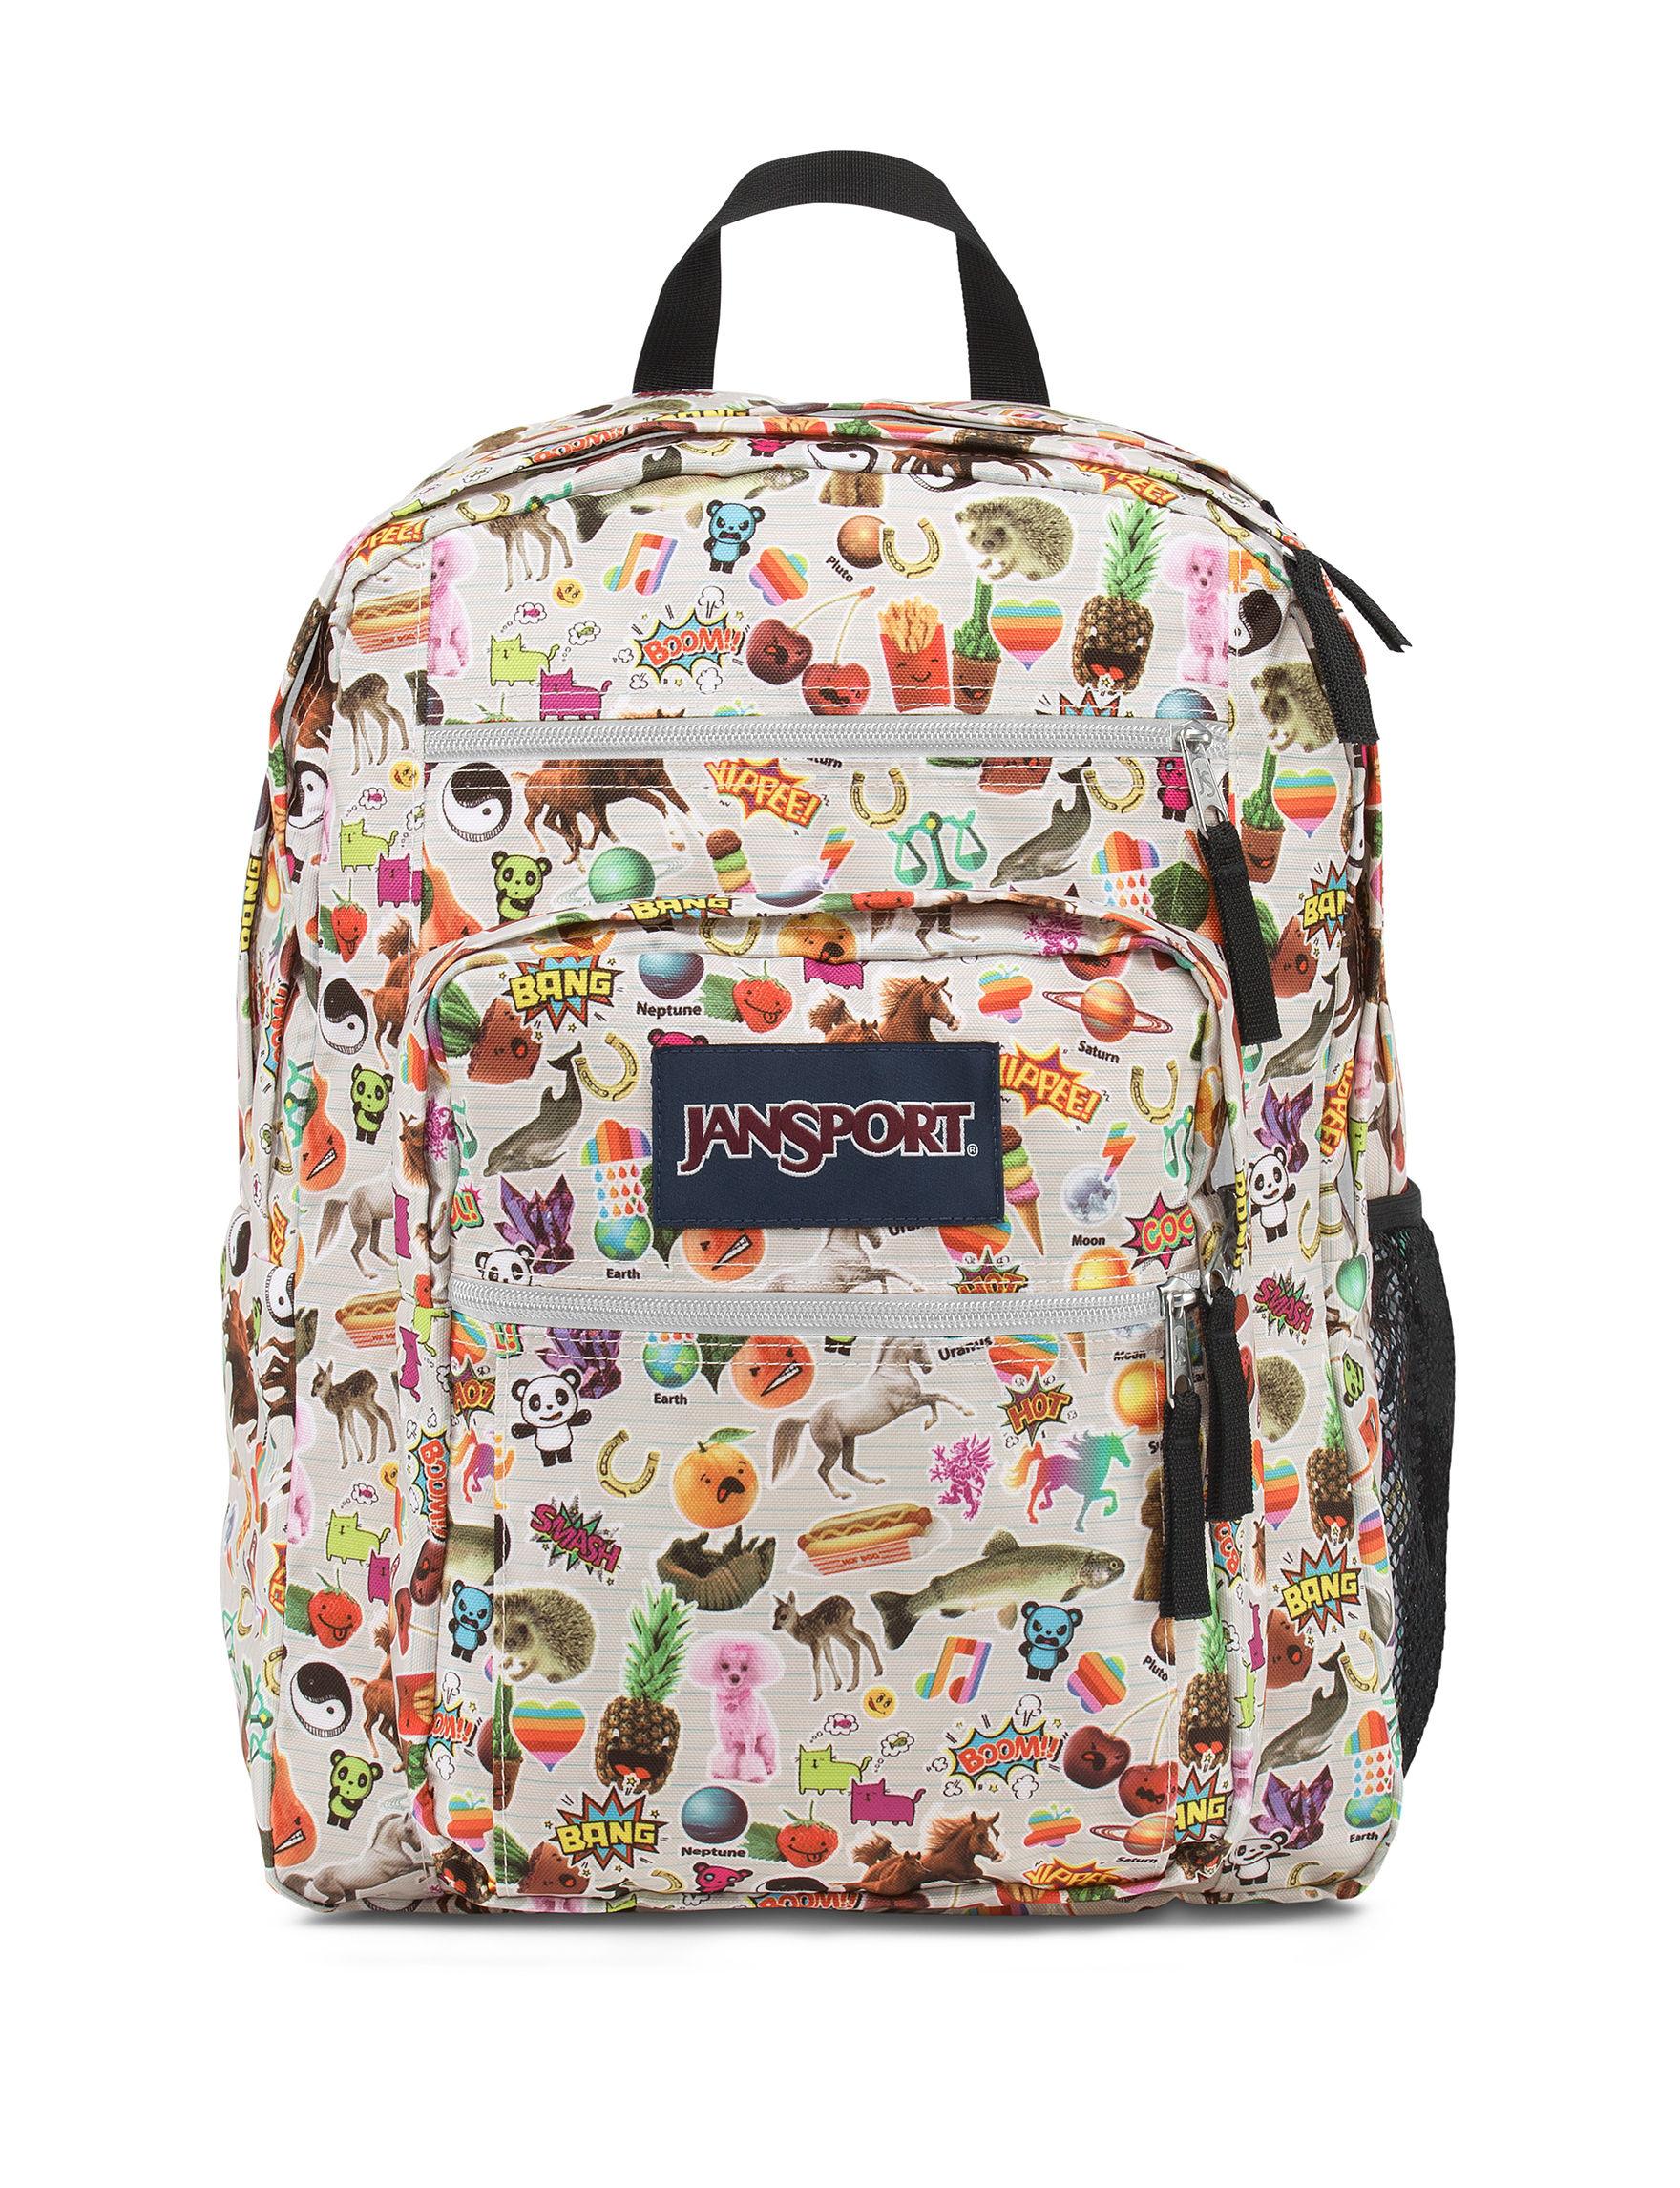 Jansport Tan Bookbags & Backpacks